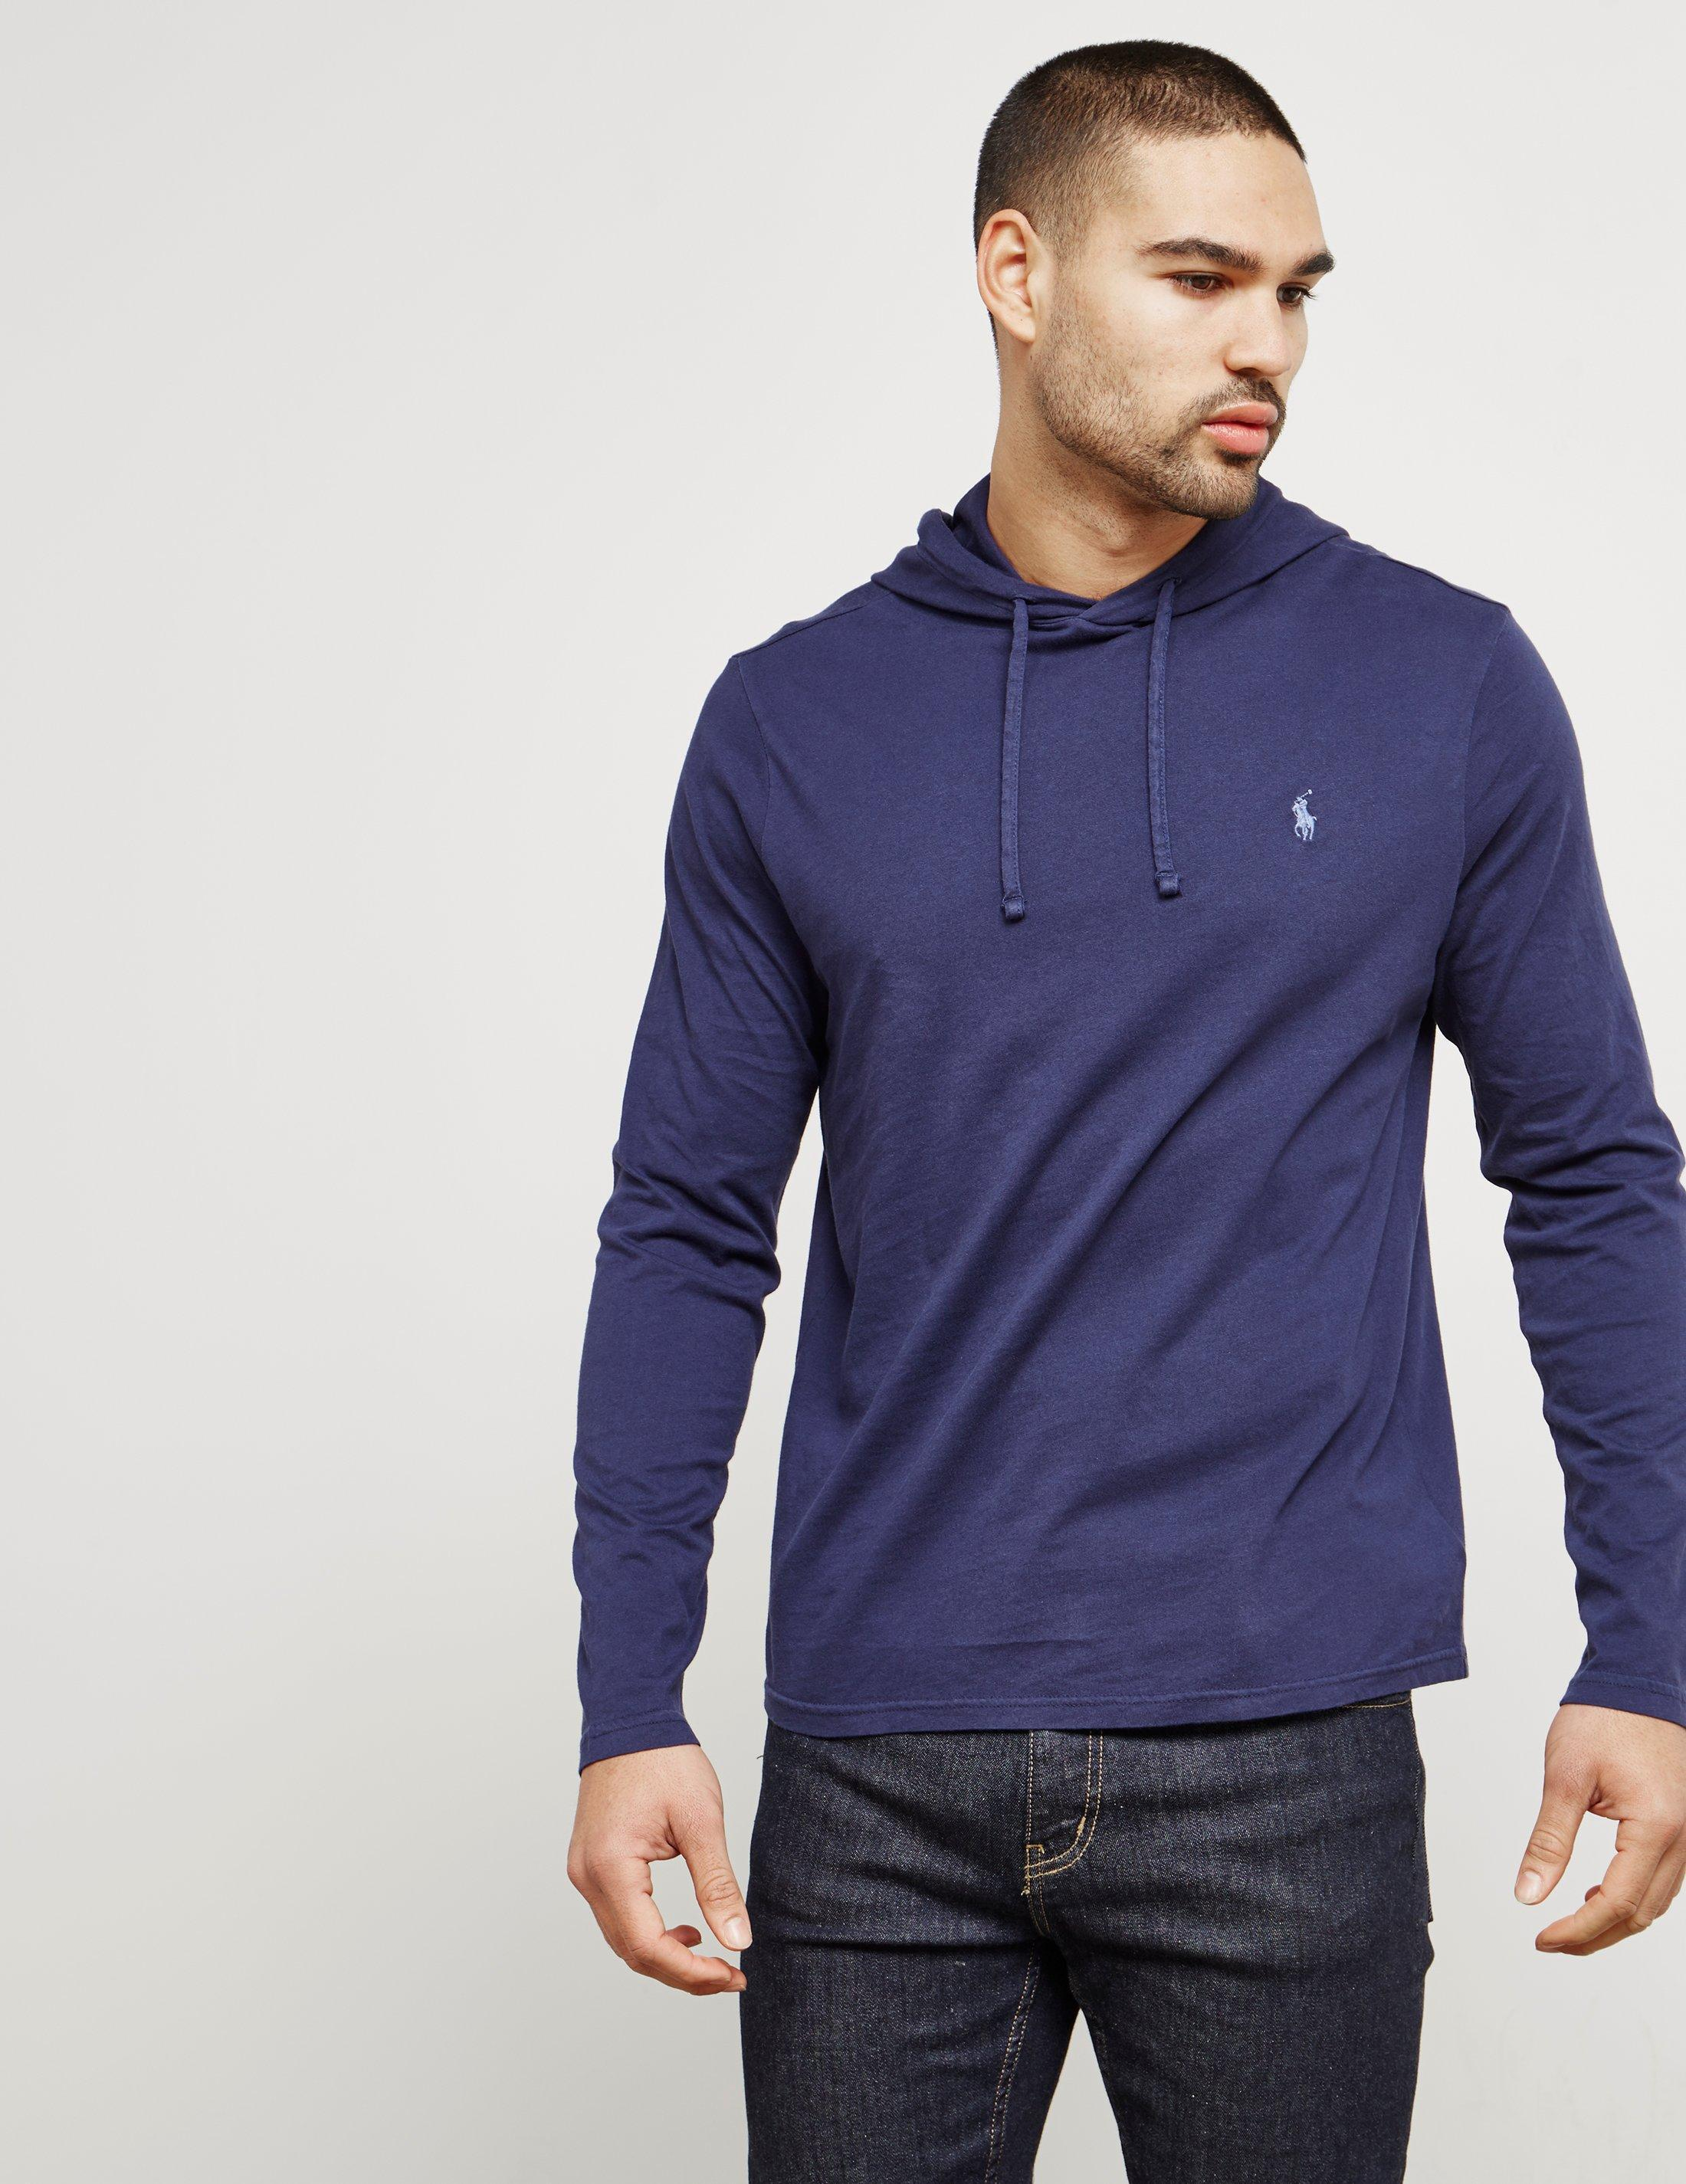 dc13cb99a Polo Ralph Lauren Mens Hooded Long Sleeve T-shirt Navy Blue in Blue ...